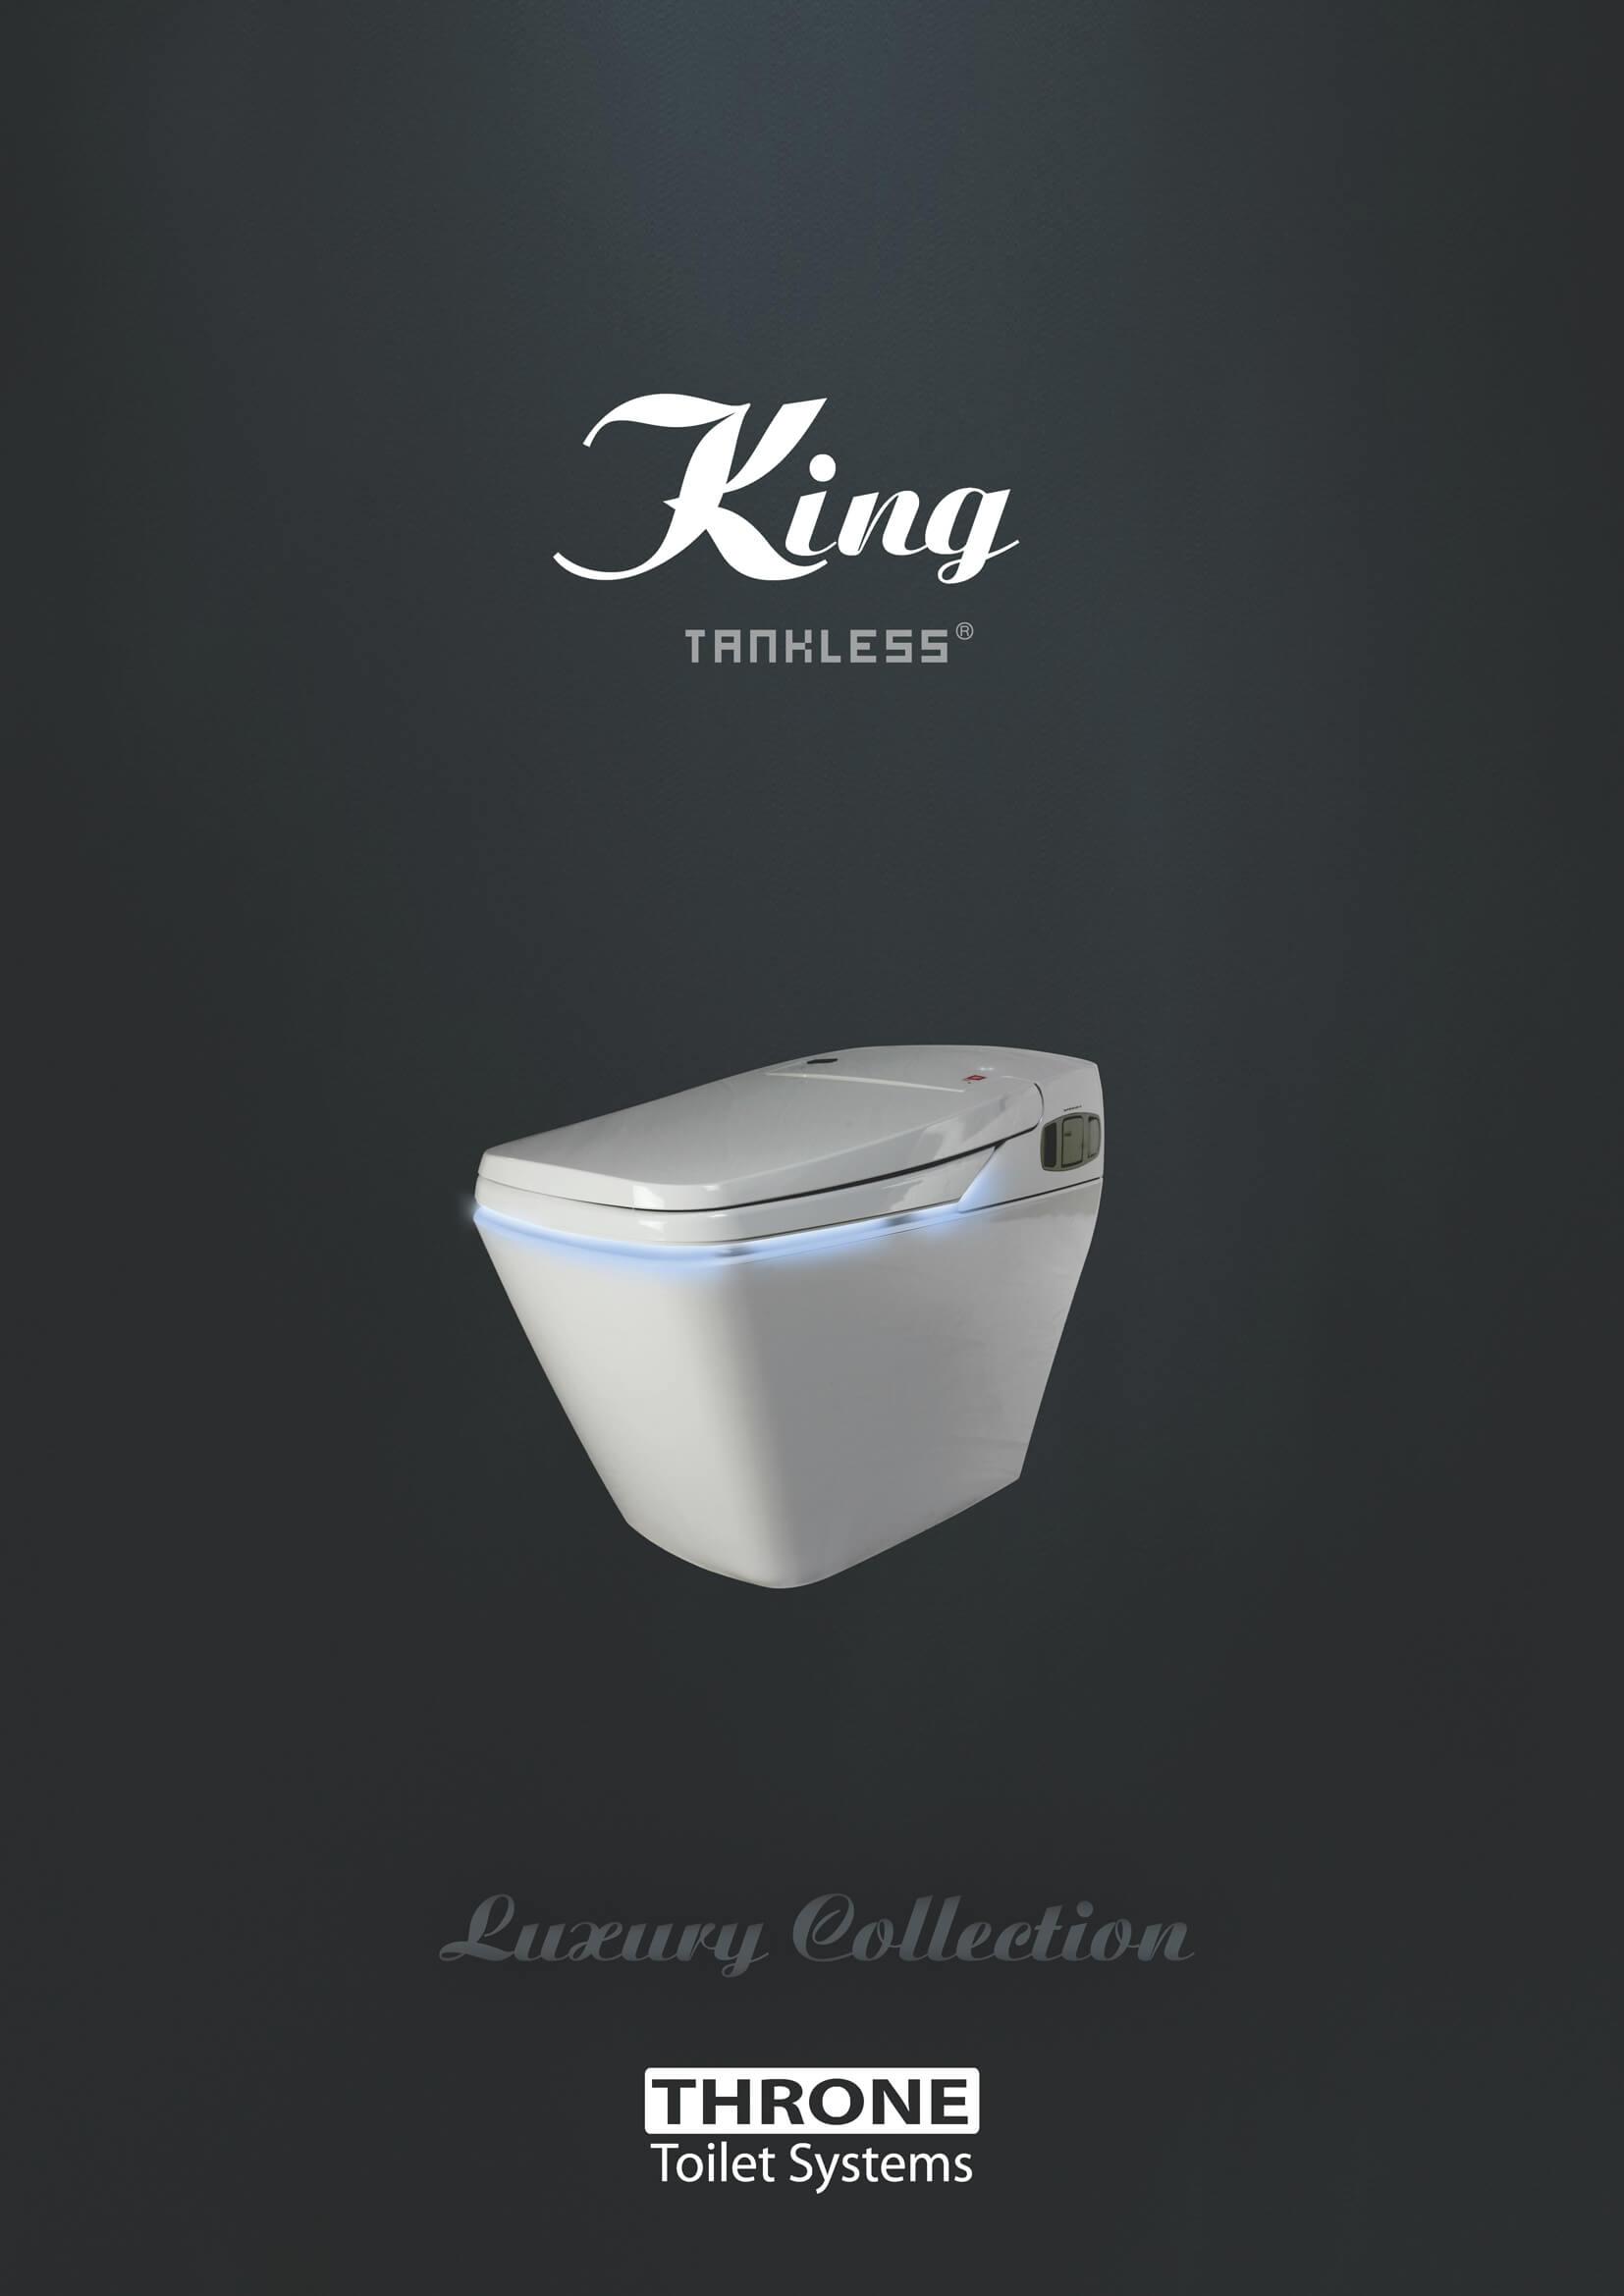 king-brochure-throne-2016-page-1.jpg